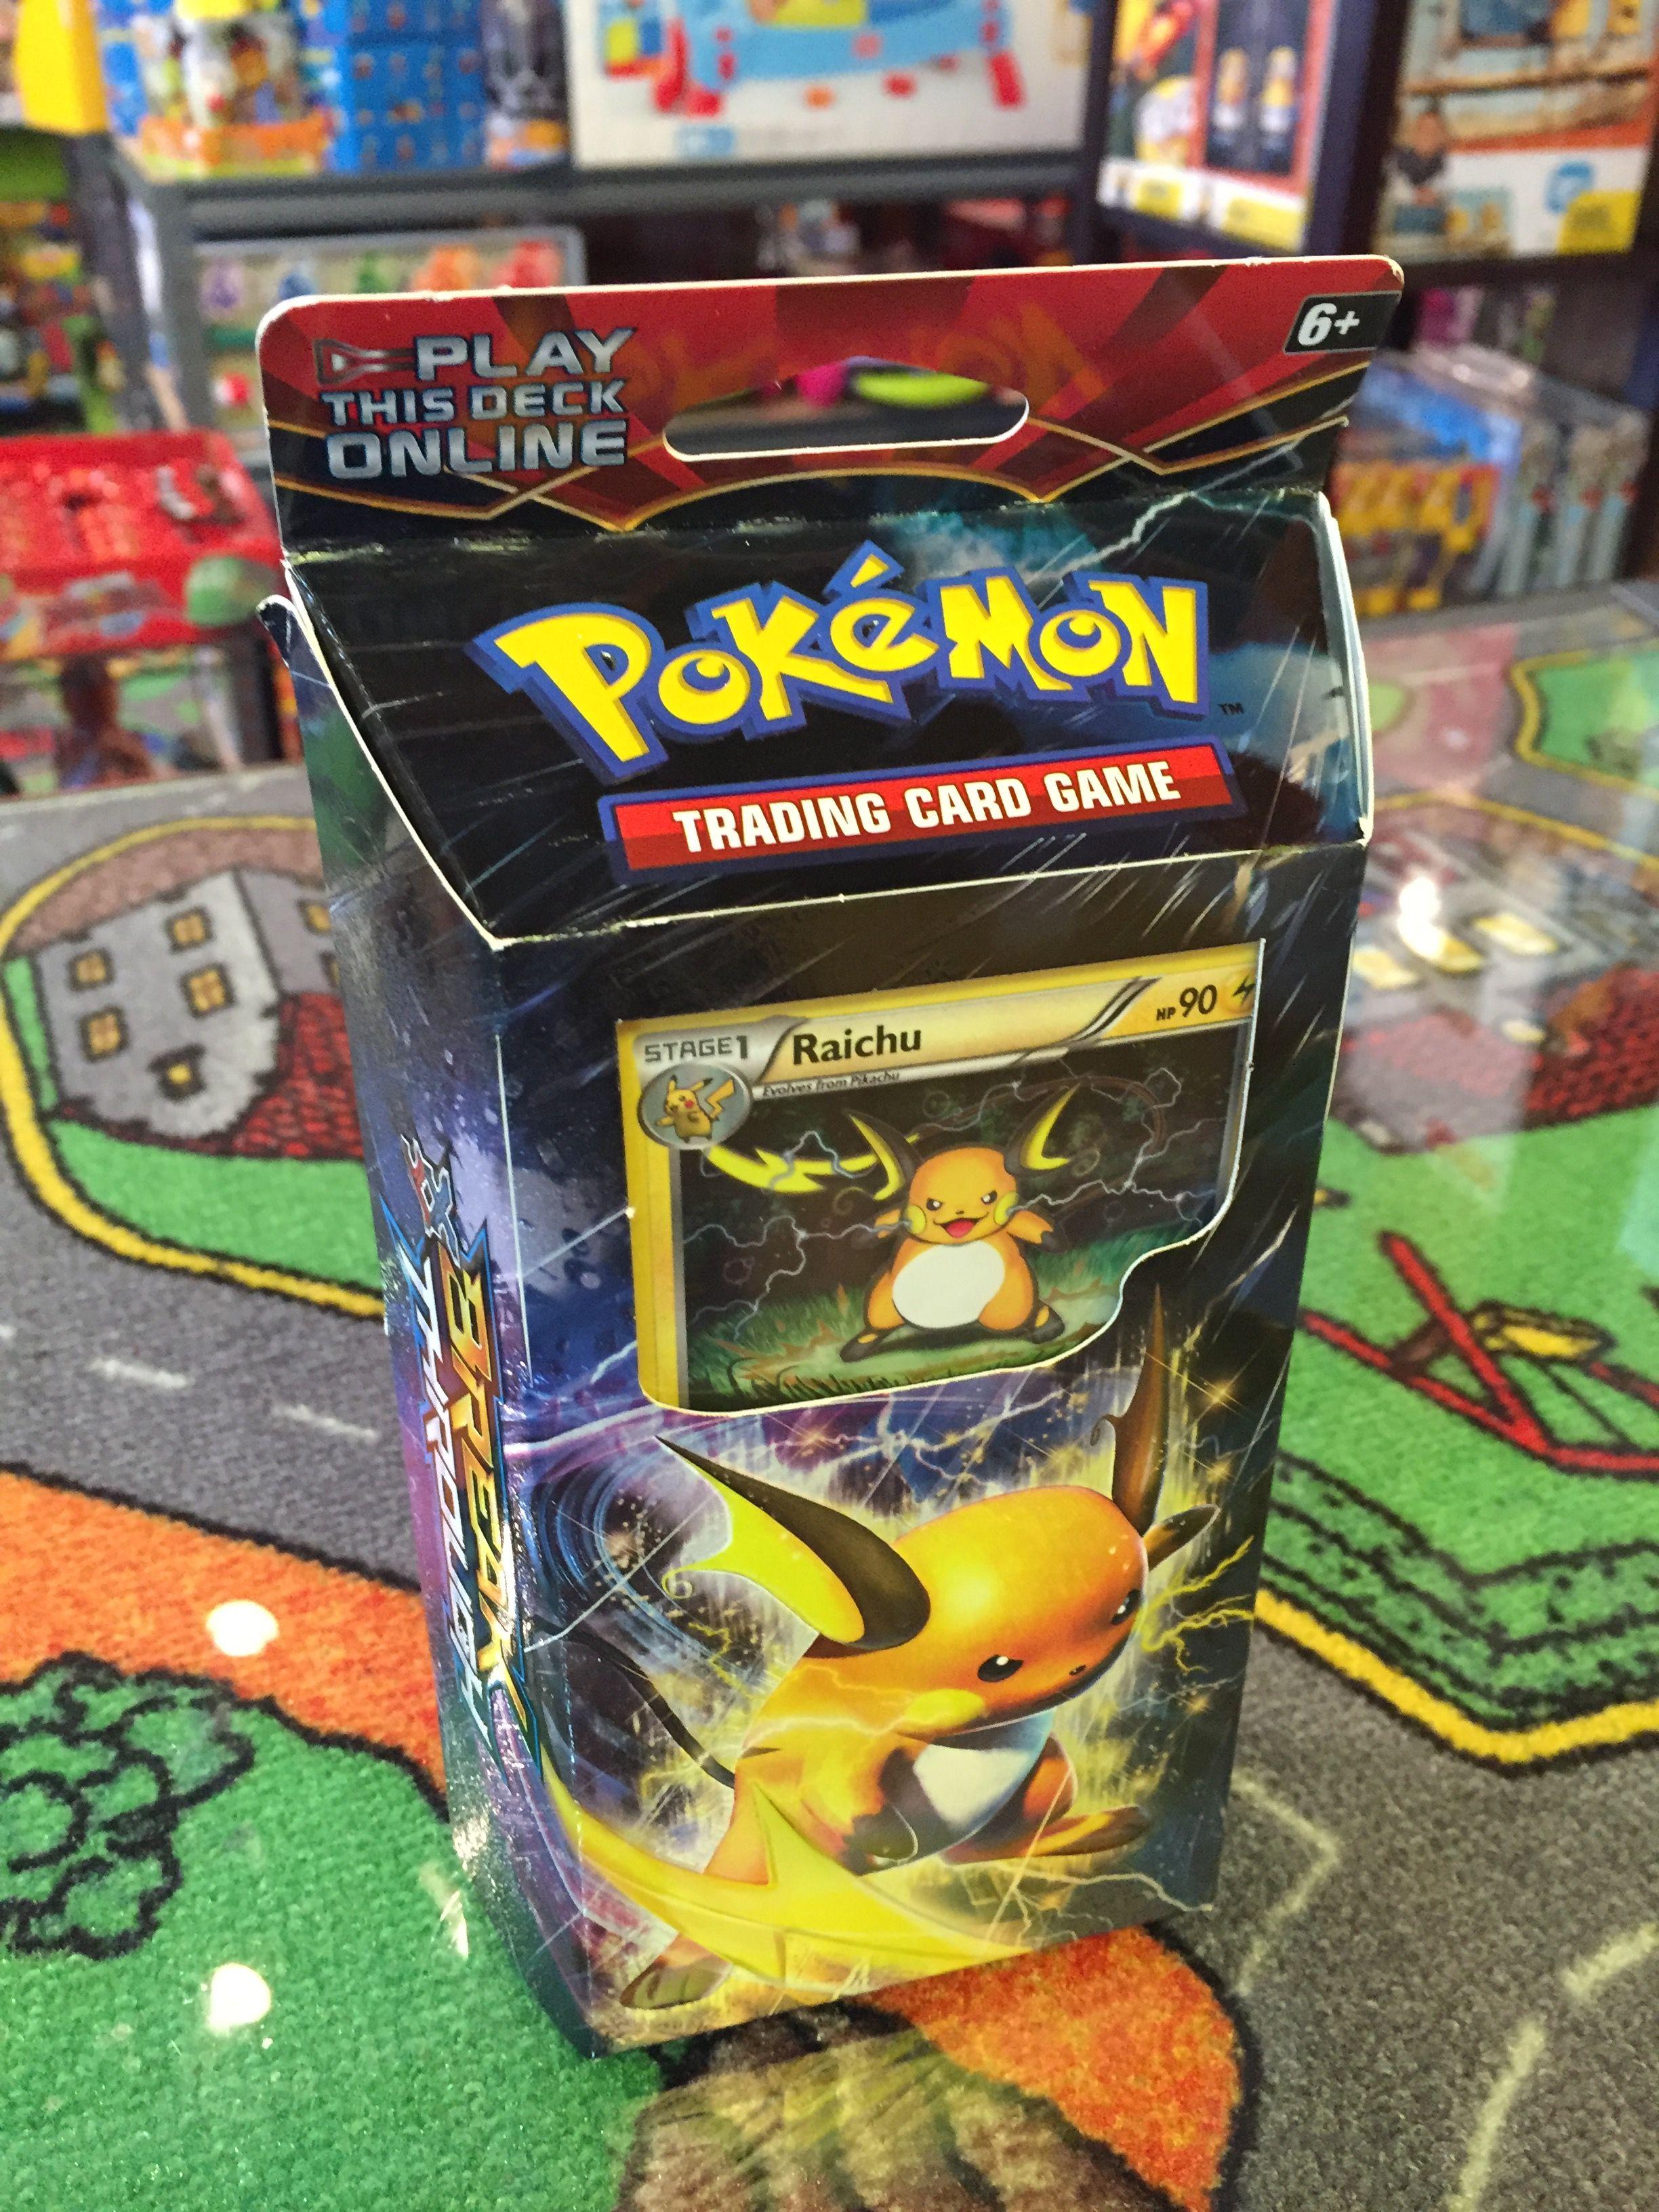 Pokemon Theme Deck Burning Spark Incluant Raichu 026 60 Cartes Pokemon 1 Checklist 1 Jeton Metallique Coin Trading Cards Game Card Games Online Trading